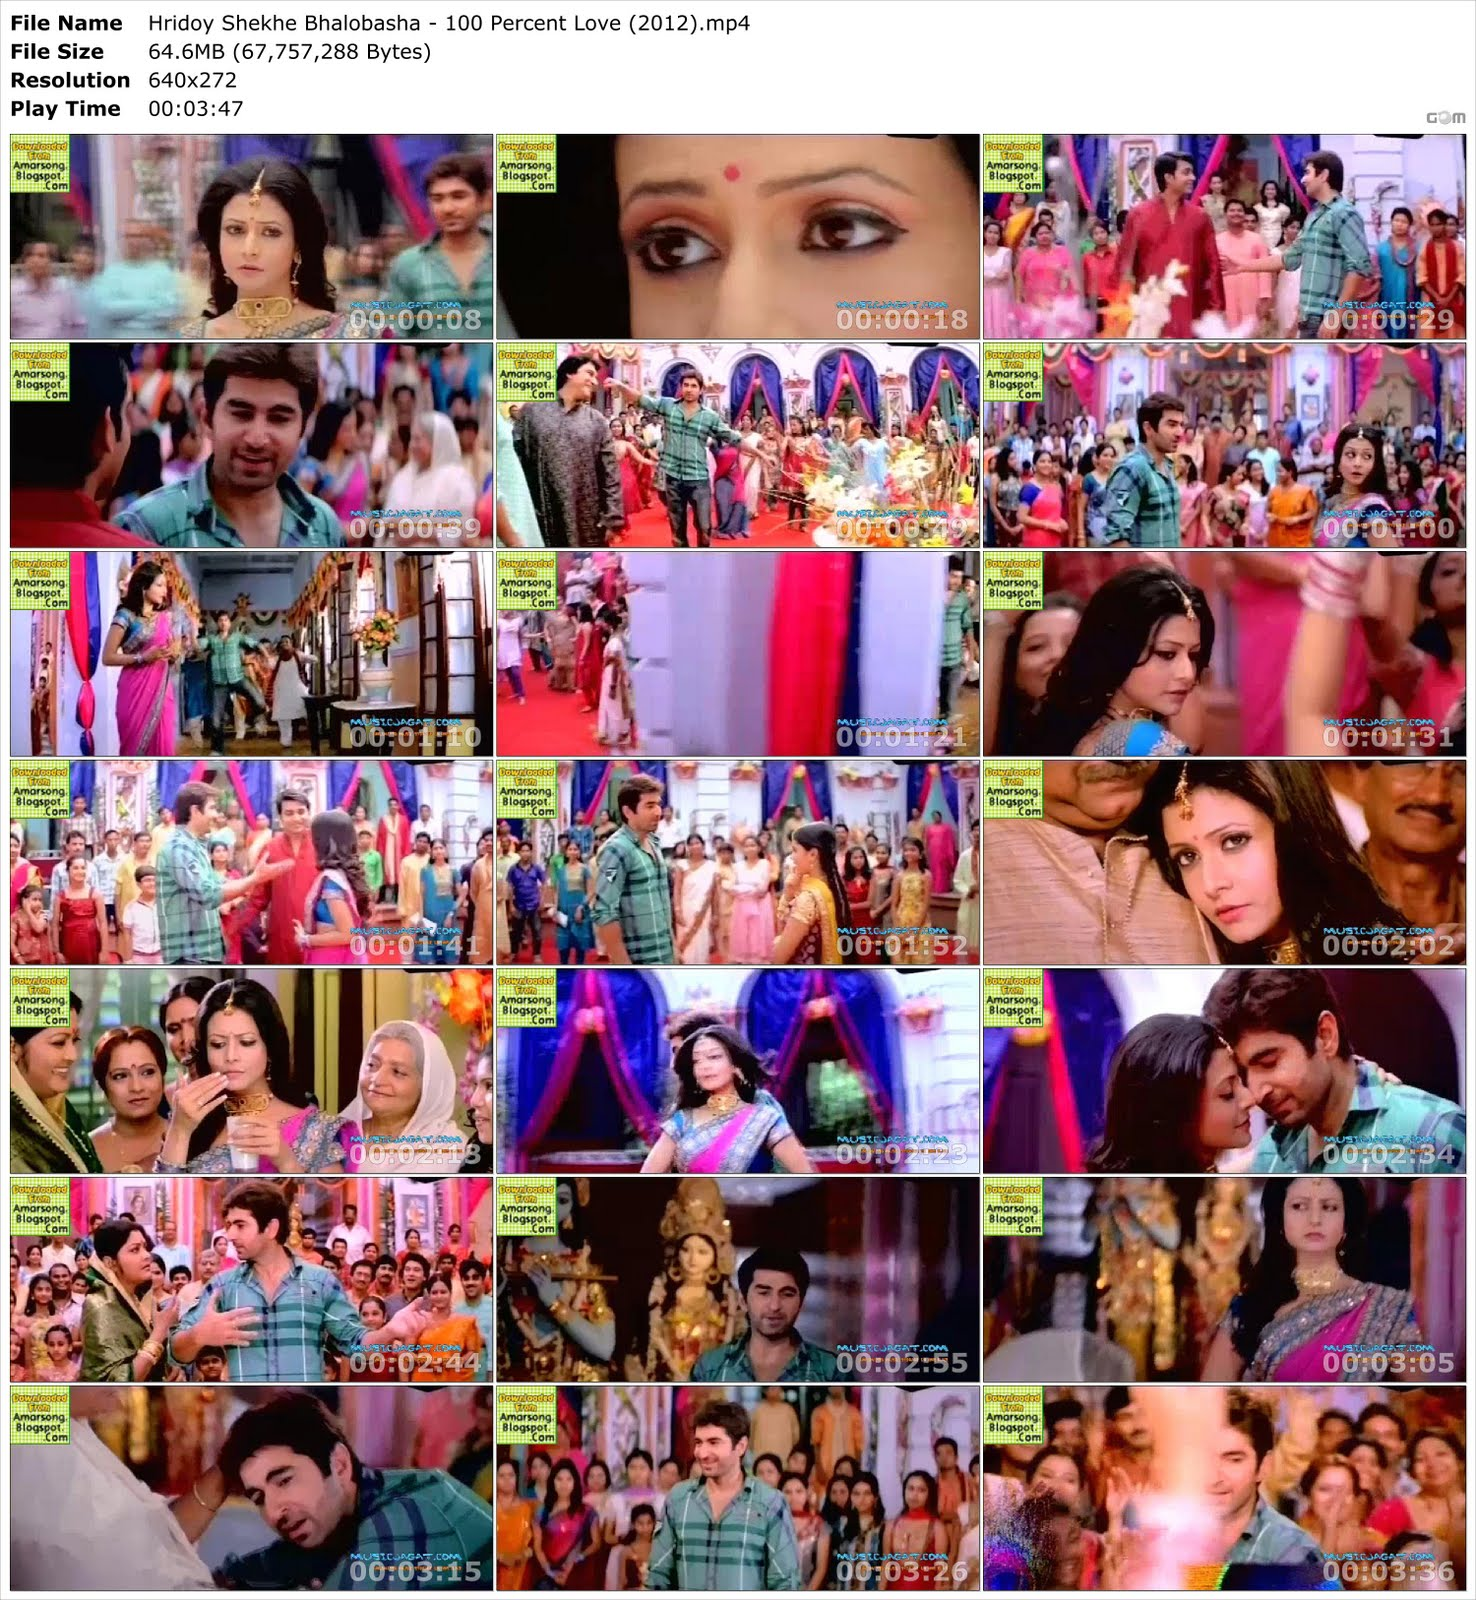 Hridoy Shekhe Bhalobasha - 100 Percent Love (2012) HD Video Download